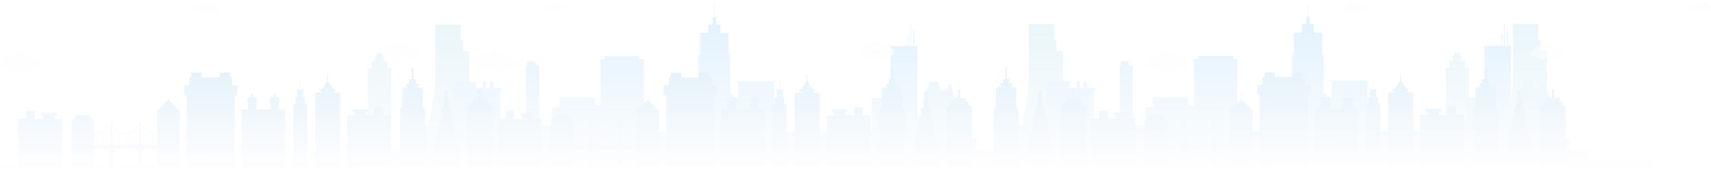 Skyscraper 1.png